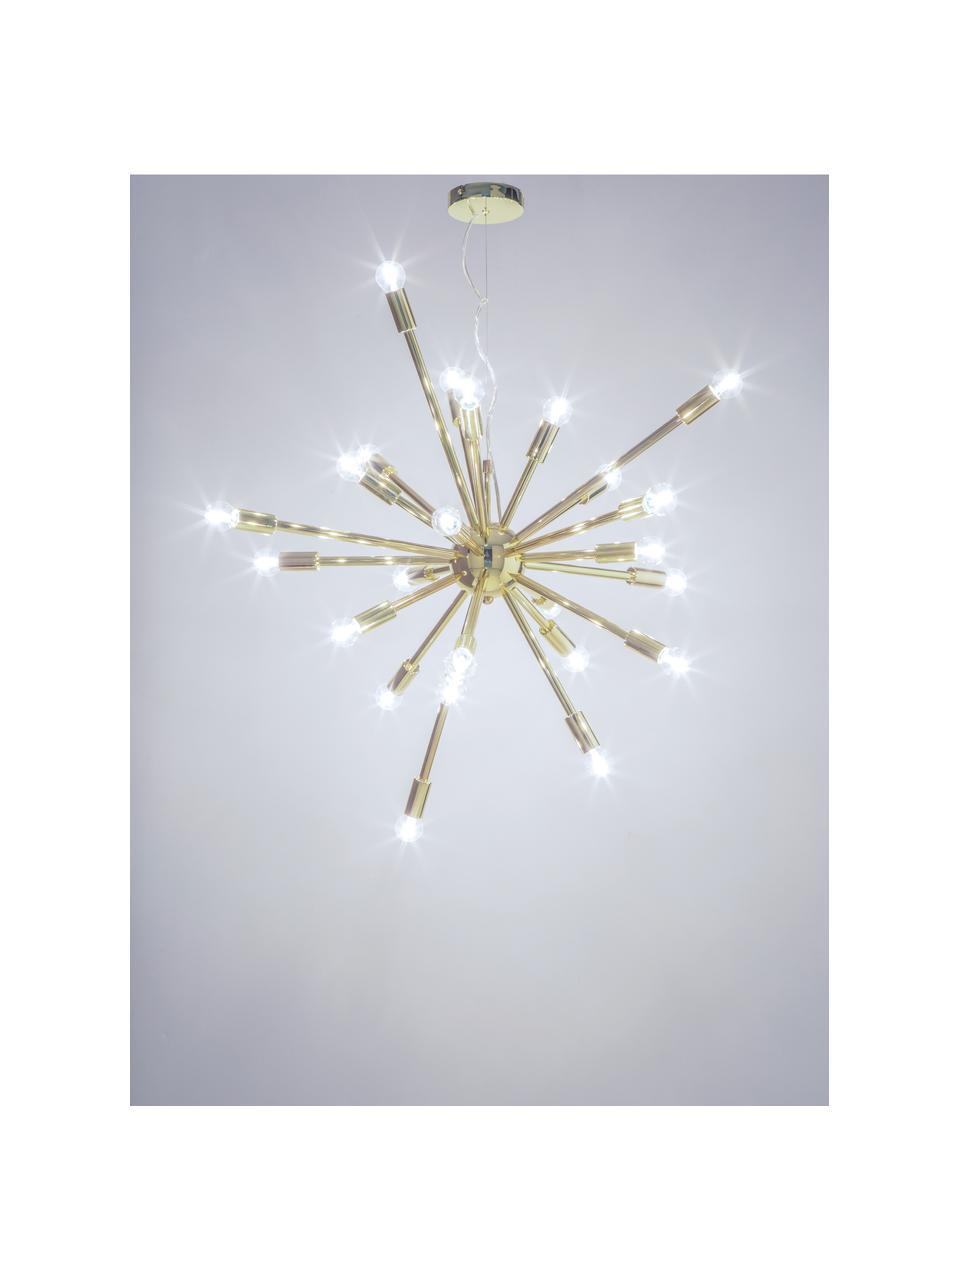 Grote hanglamp Spike in goudkleur, Baldakijn: metaal, Lampenkap: metaal, Baldakijn: goudkleurig. Lampenkap: goudkleurig. Snoer: transparant, Ø 90 cm